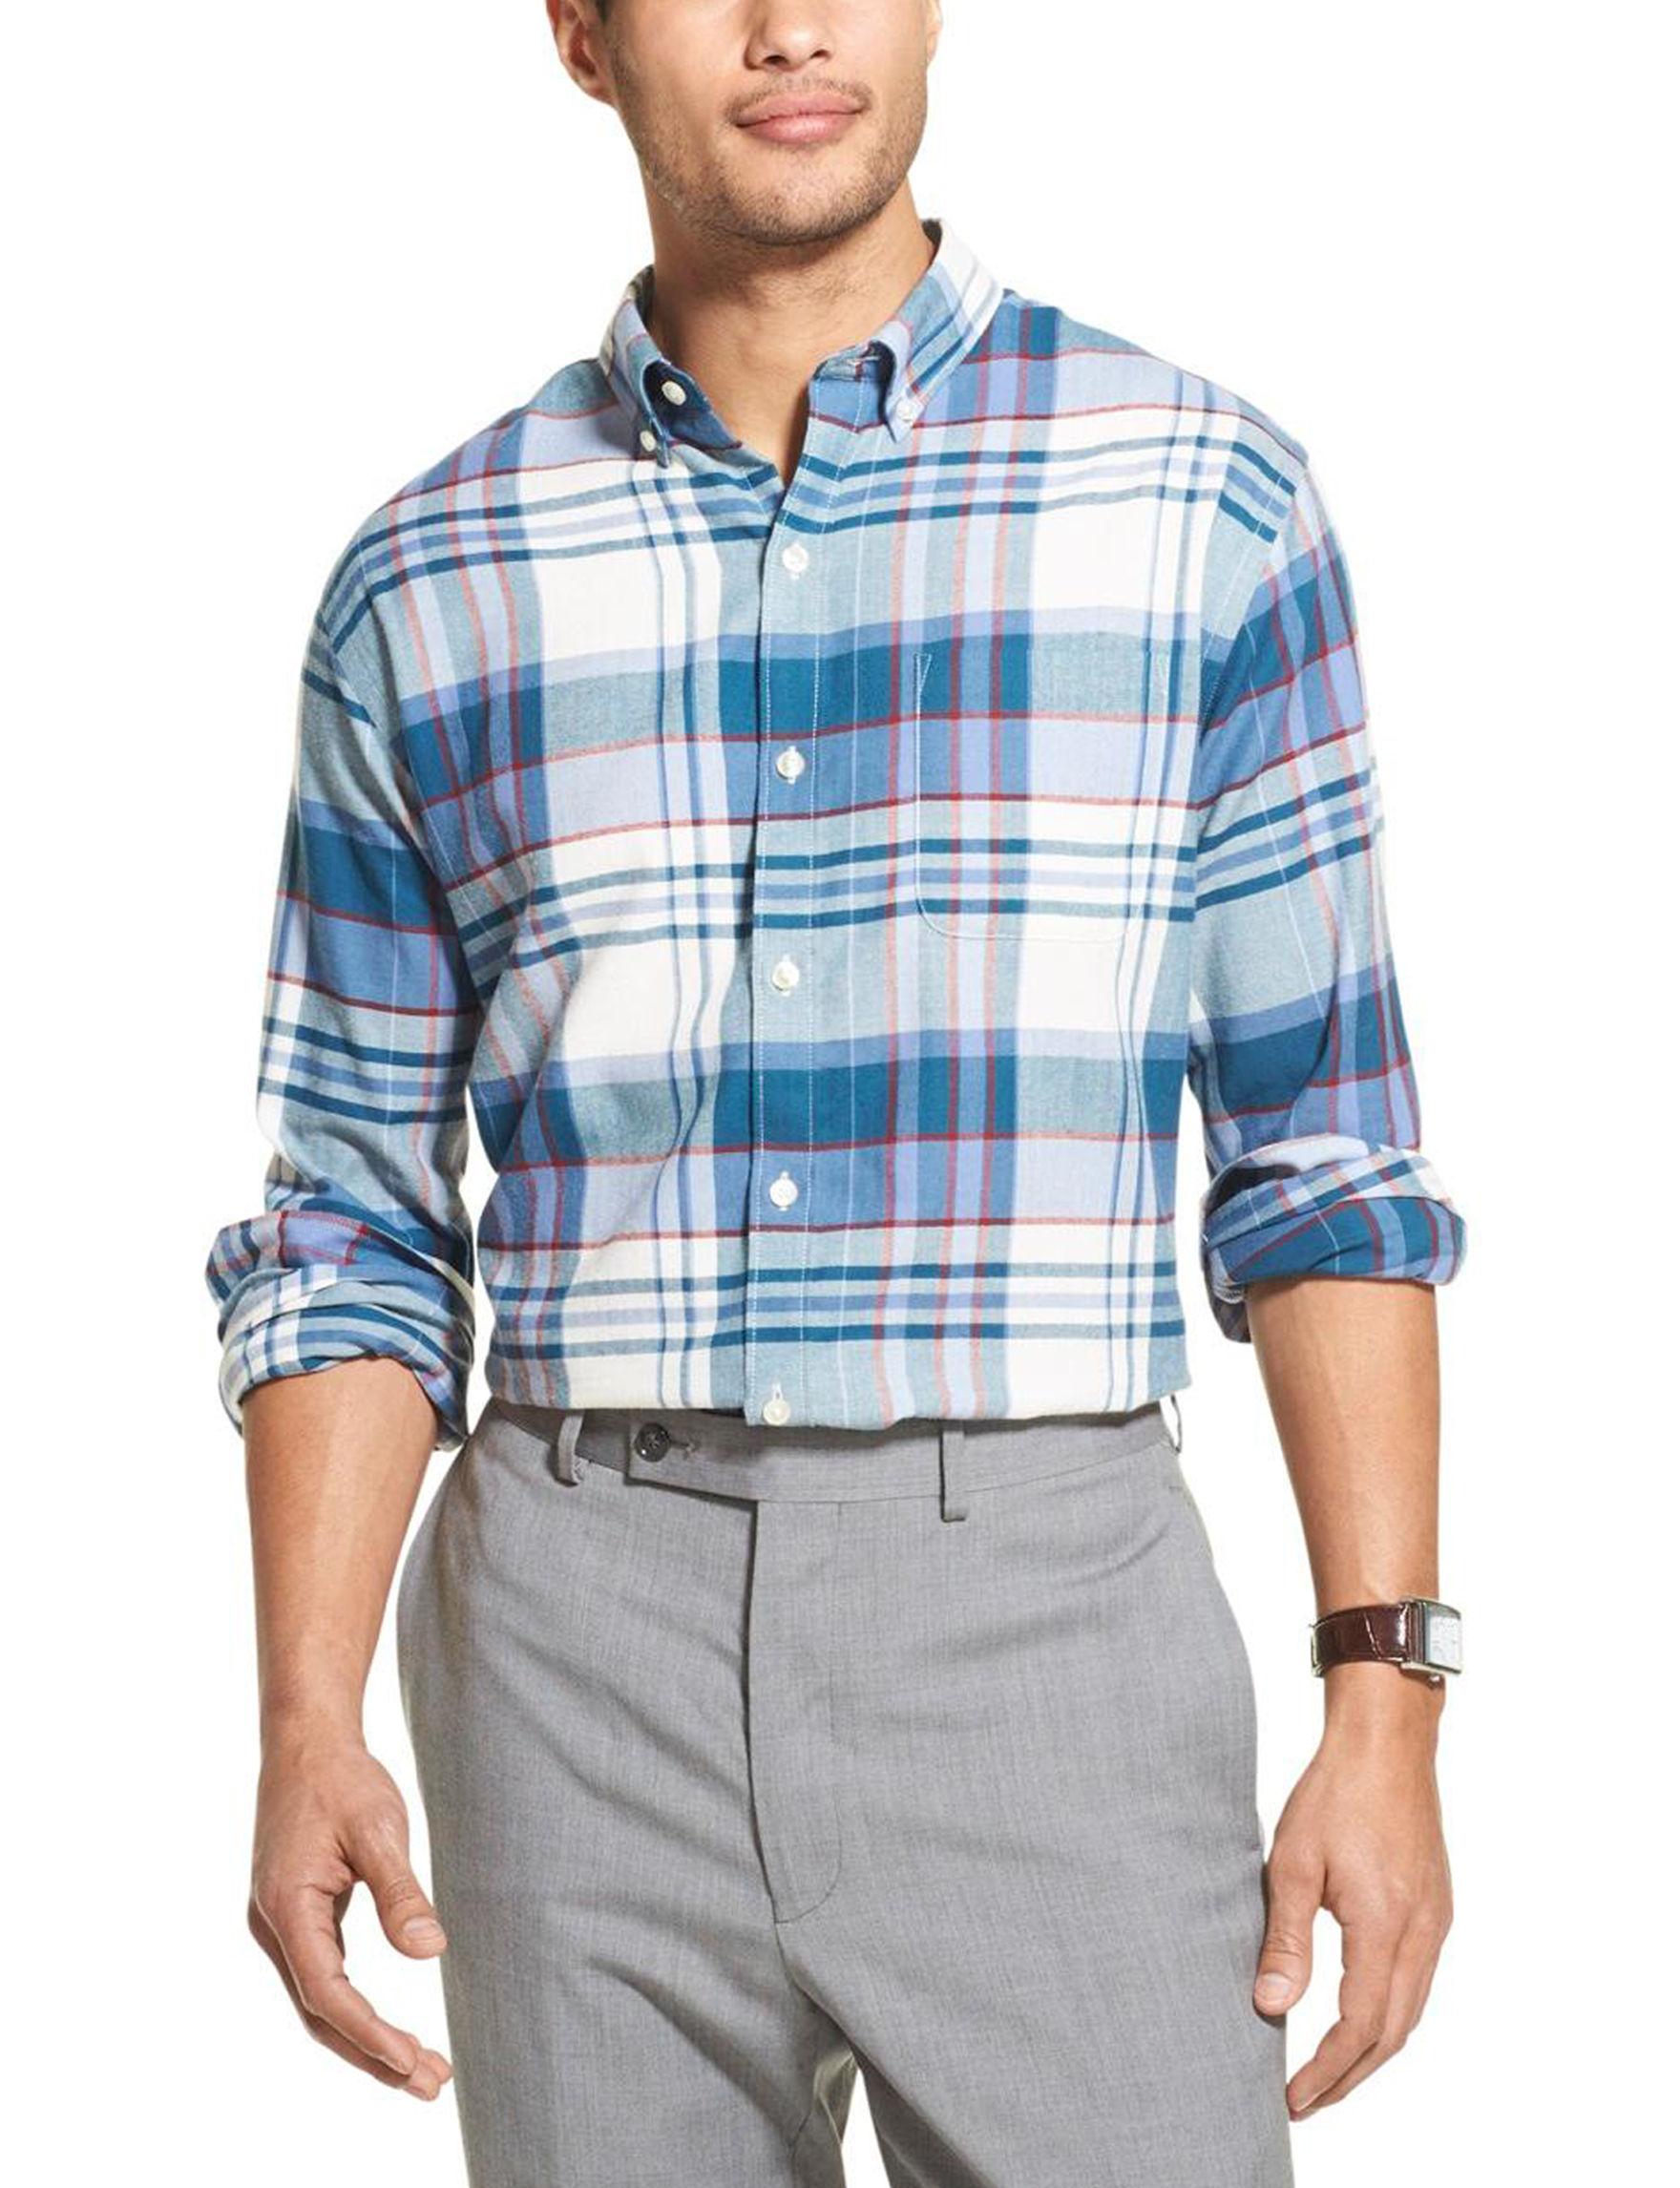 Van Heusen Colony Blue Casual Button Down Shirts